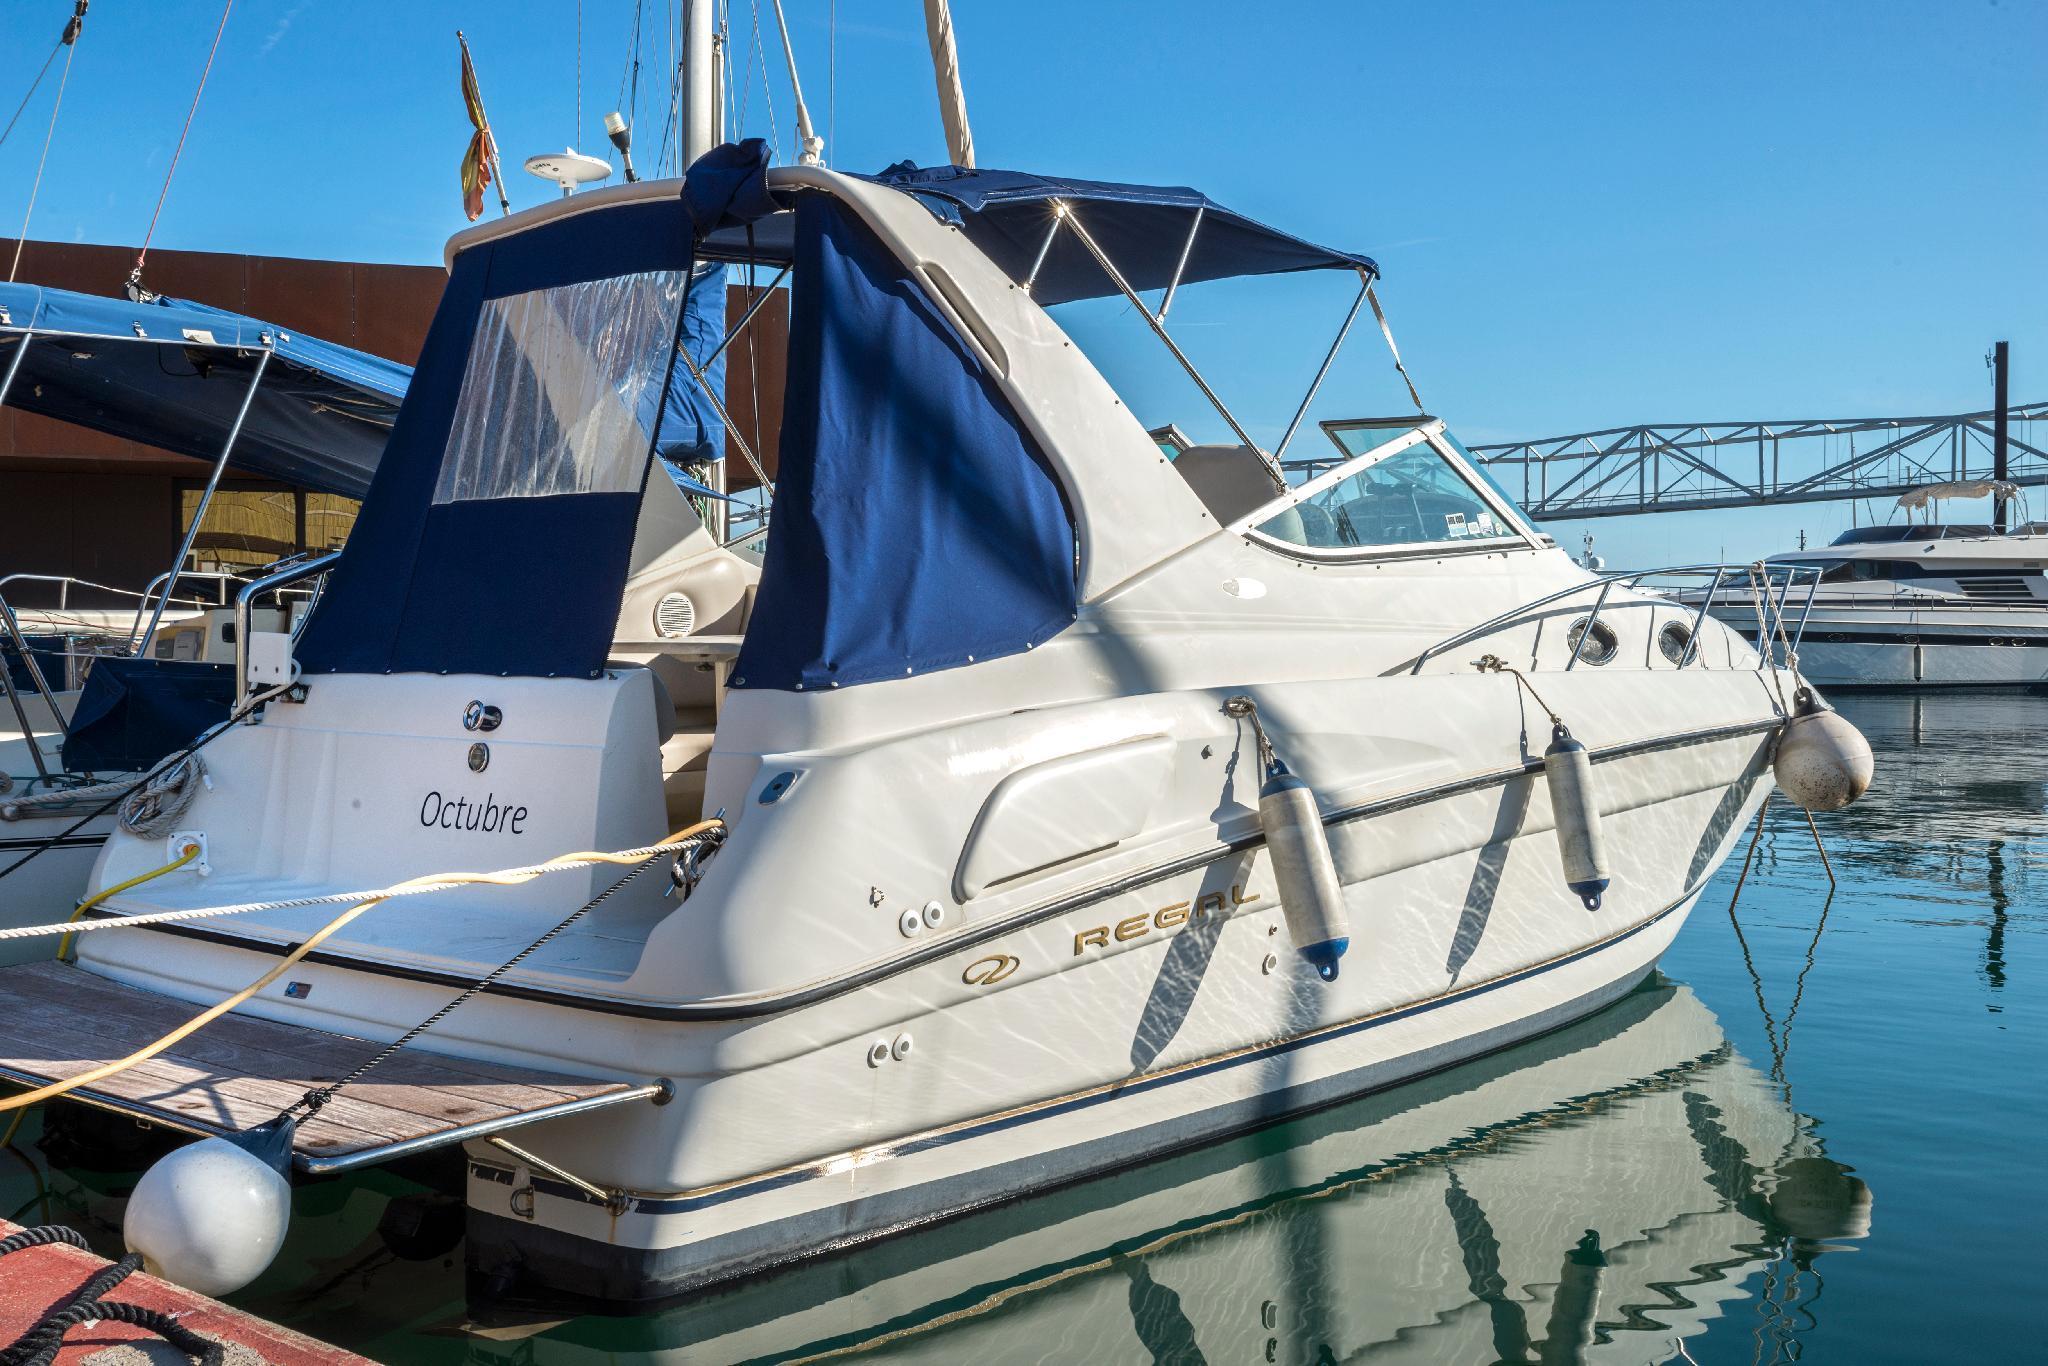 Charming Motorboat in Barcelona